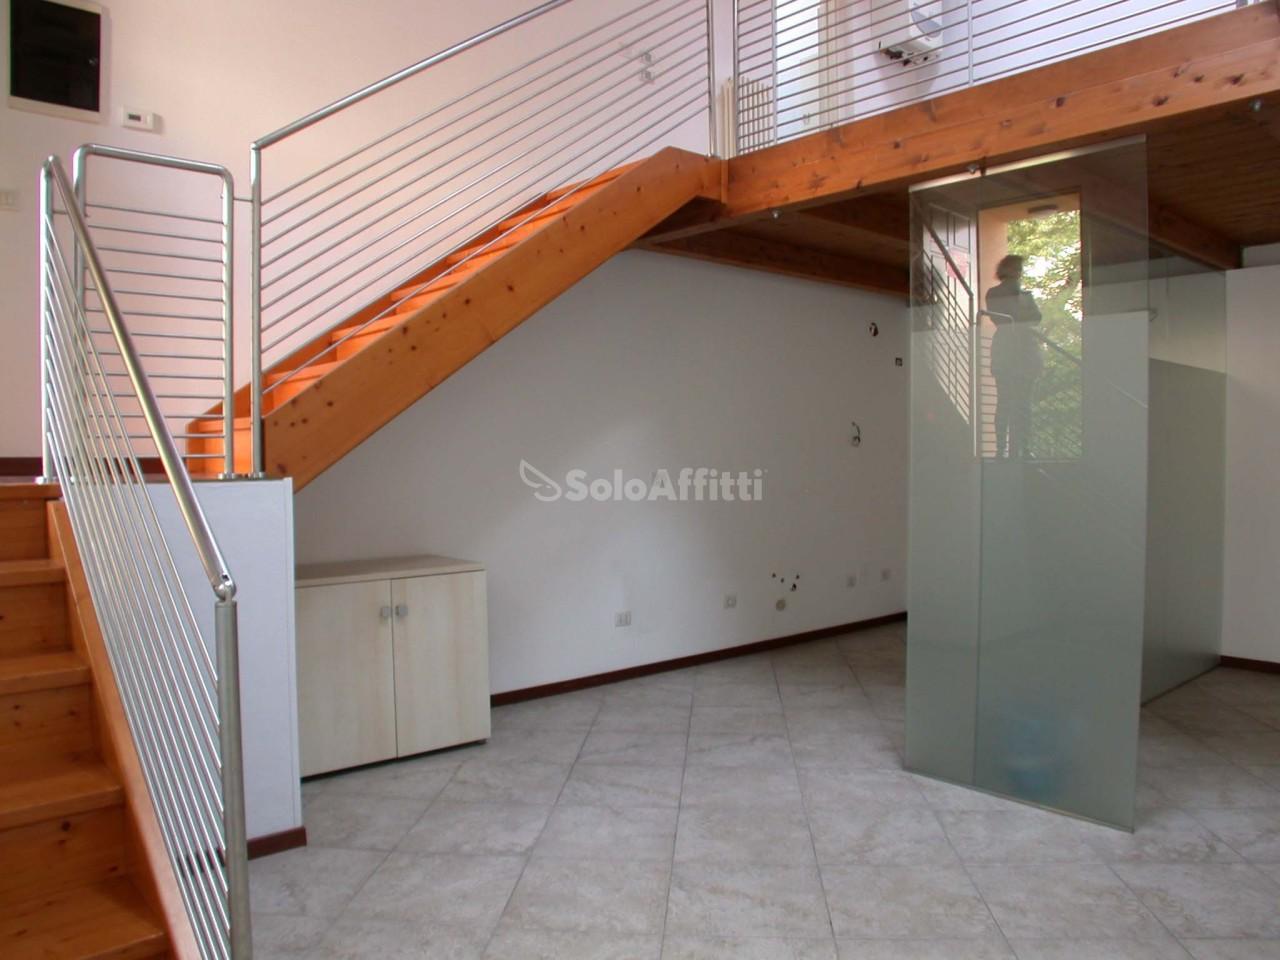 Appartamento, 100 Mq, Affitto - Pesaro (Pesaro Urbino)